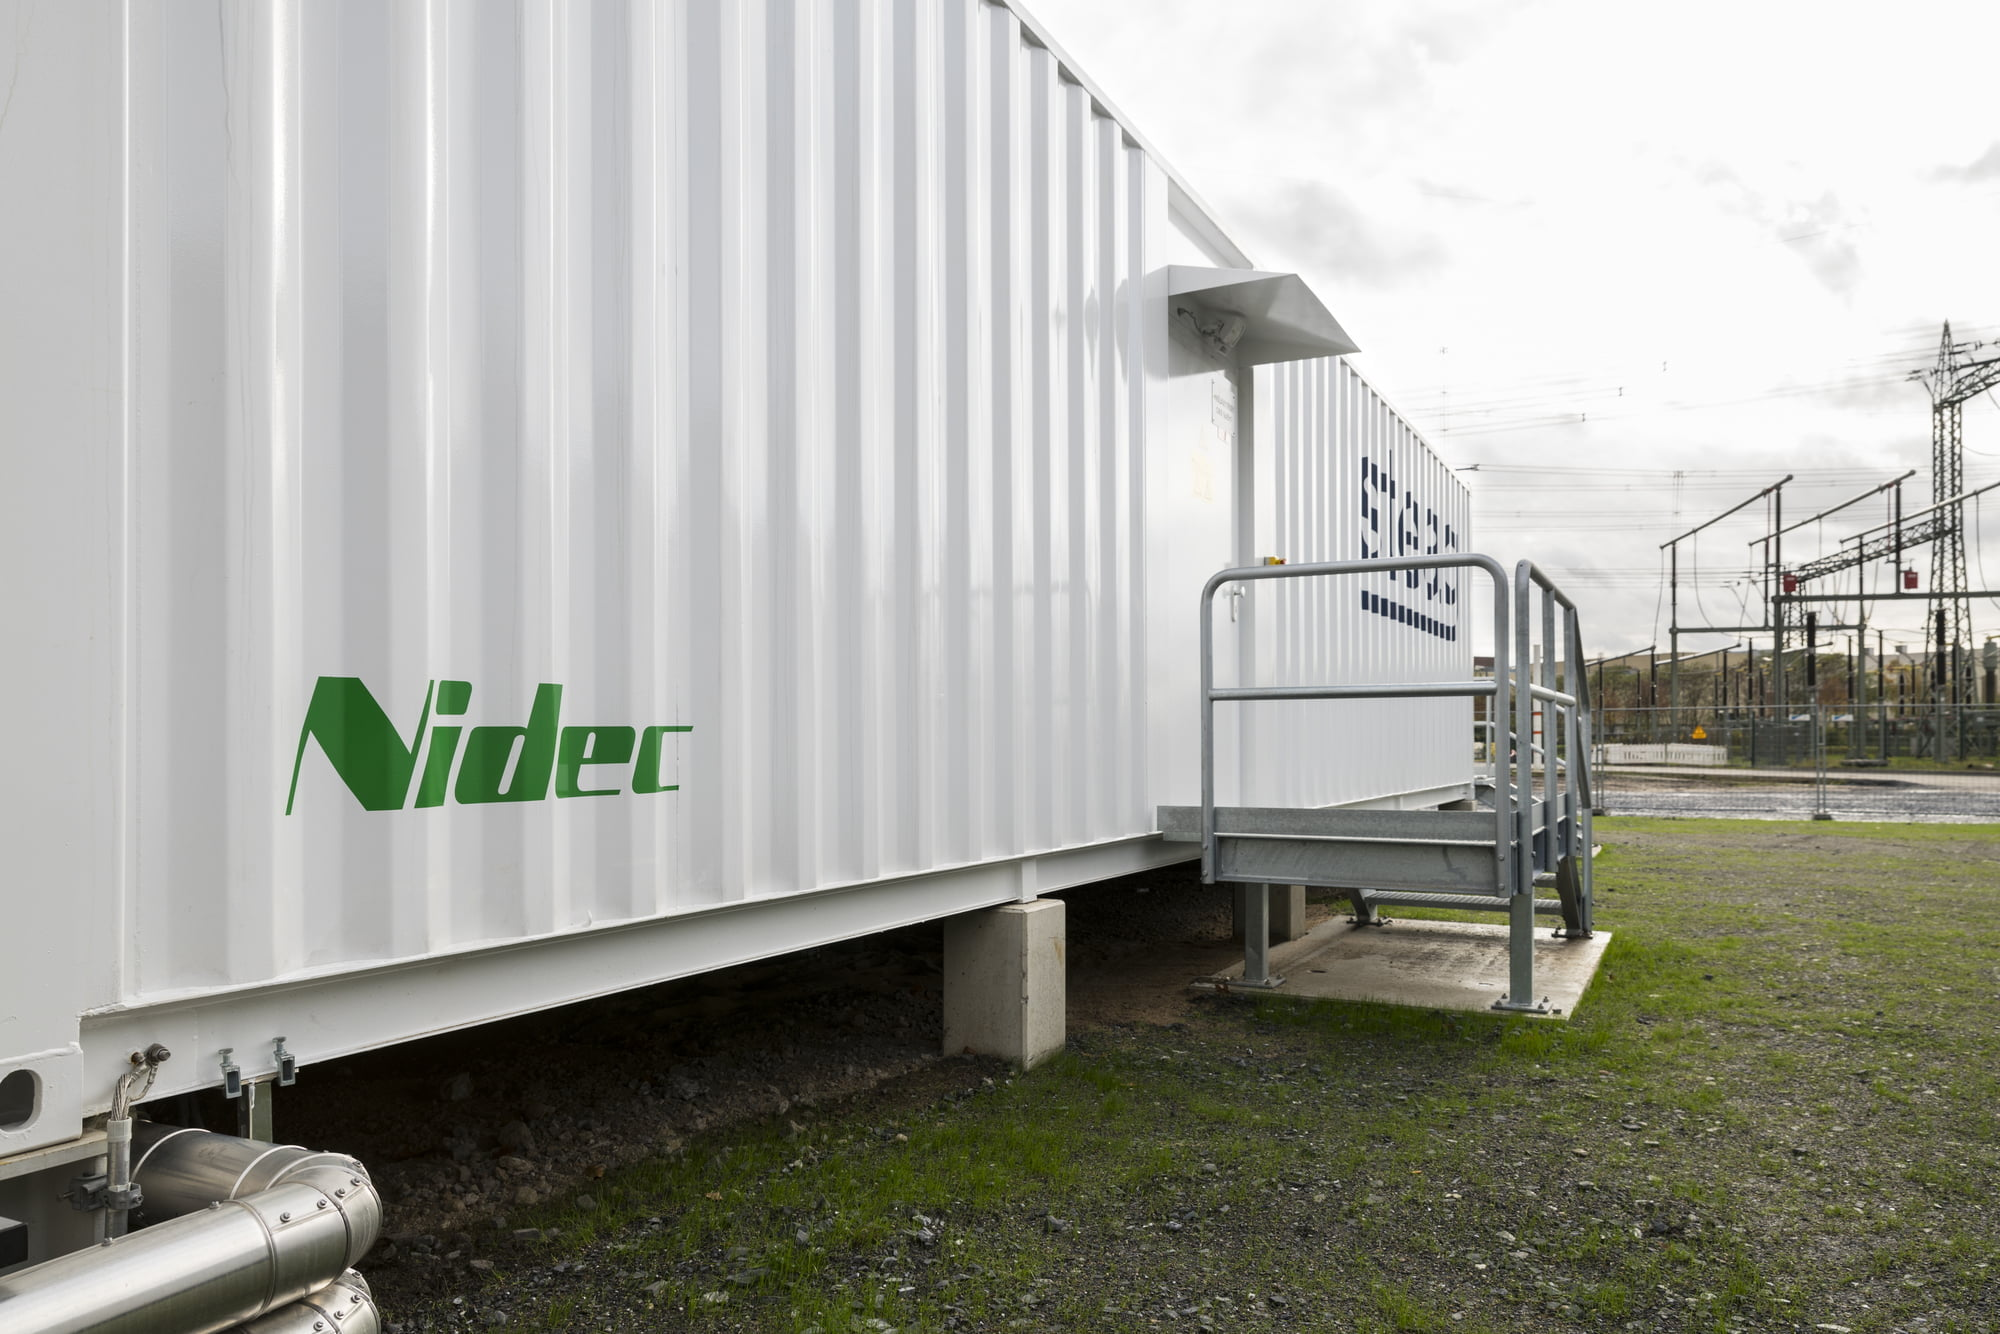 Eröffnung GBS Duisburg Walsum, Nidec ASI, Steag, Germany, 2016-11-17